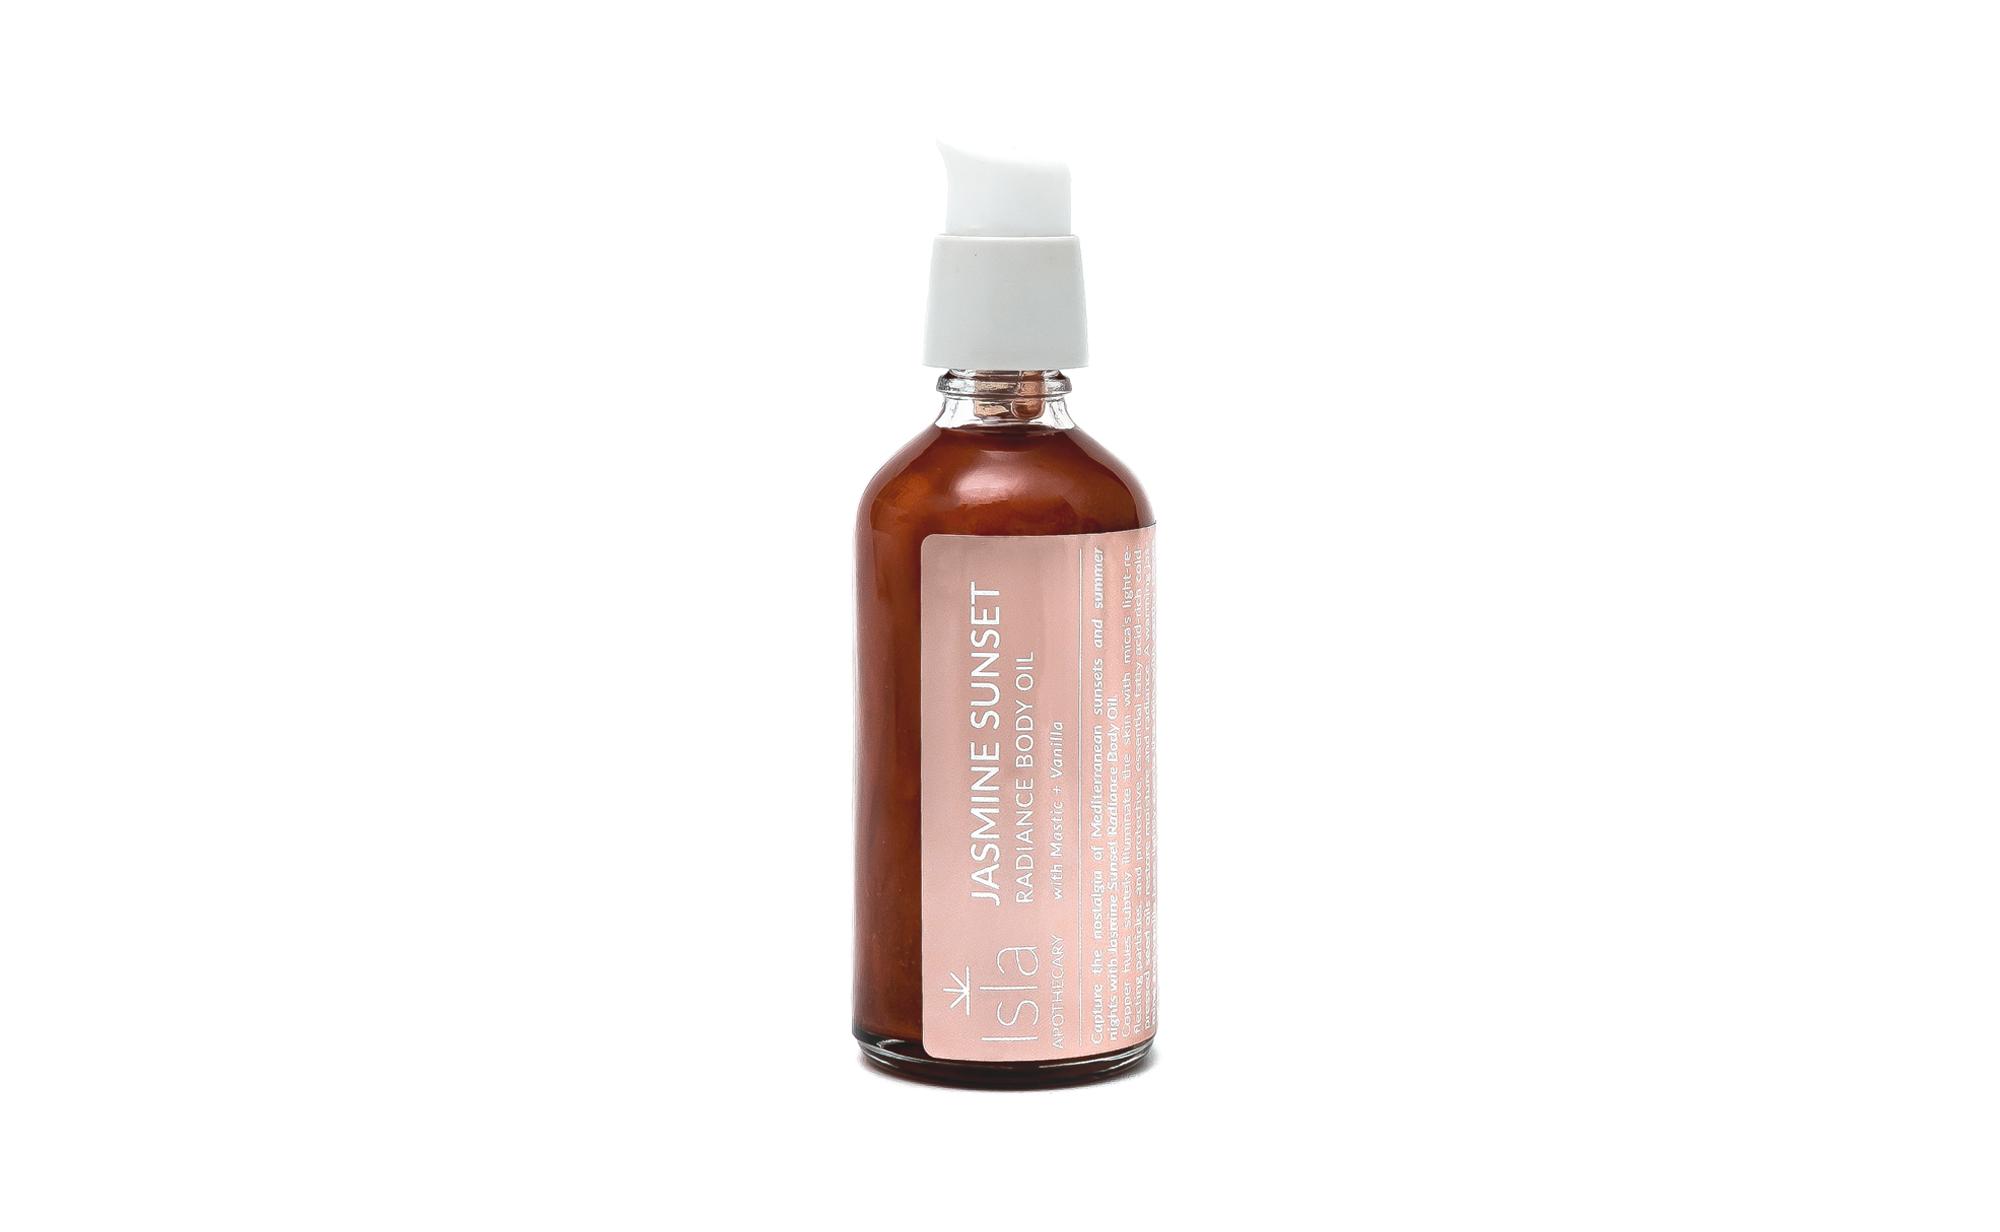 Jasmine Sunset Radiance Body Oil